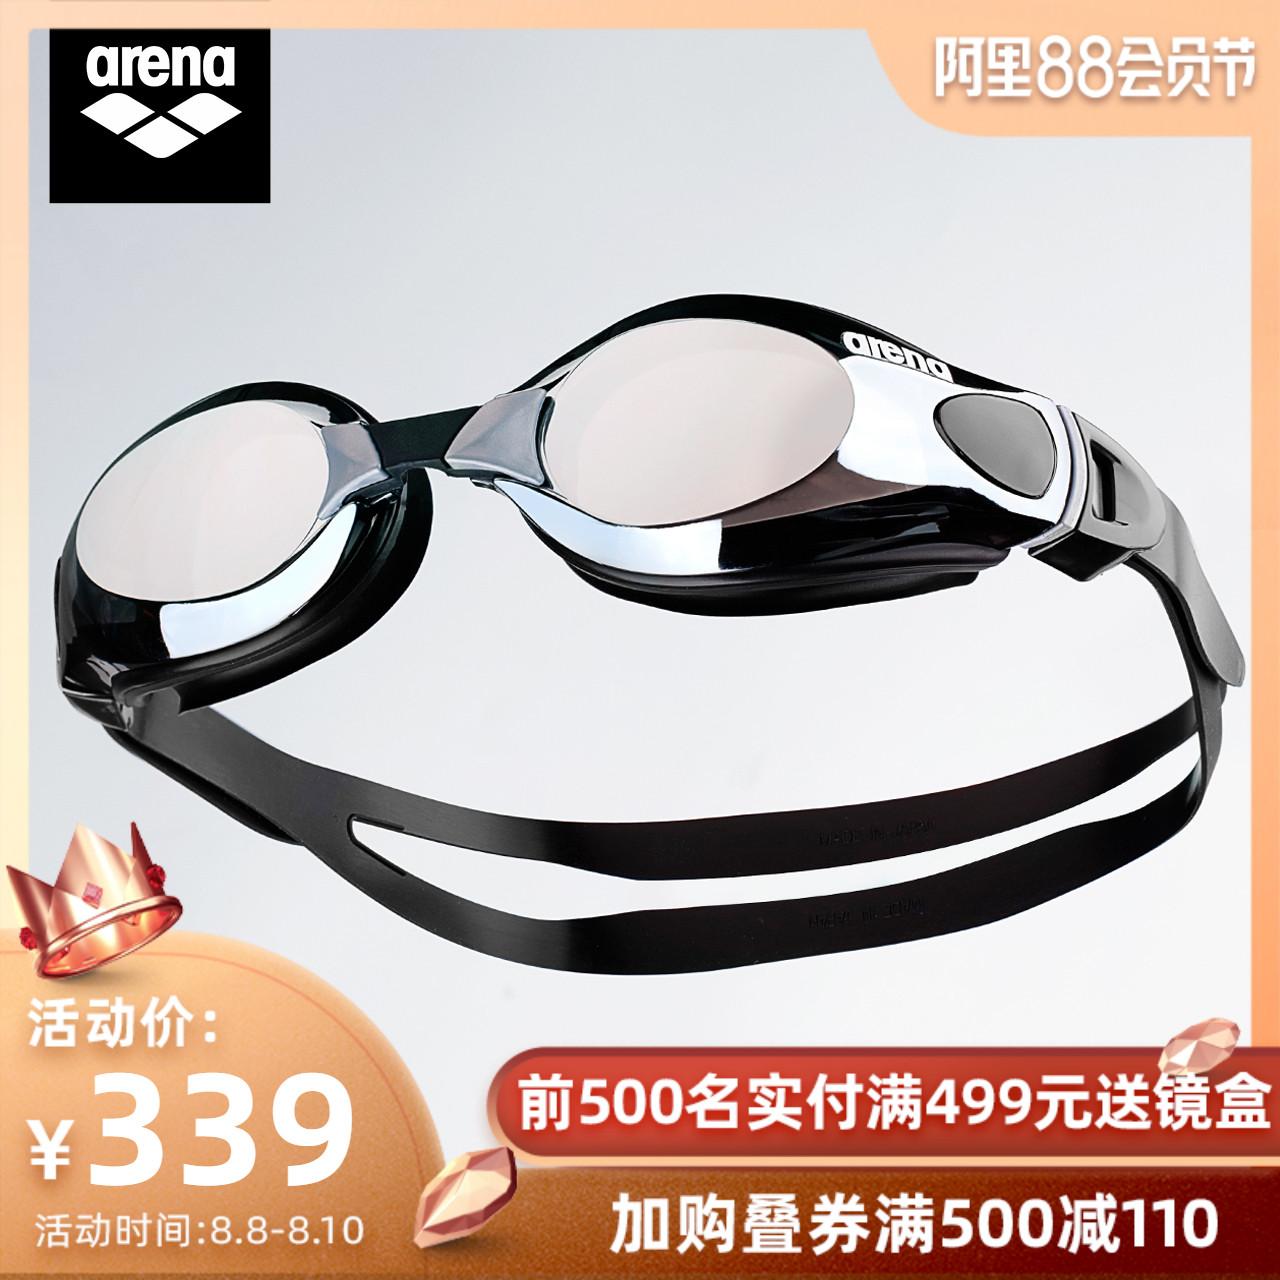 arena阿瑞娜  炫彩鍍膜泳鏡 防霧防水訓練款游泳鏡 進口游泳裝備